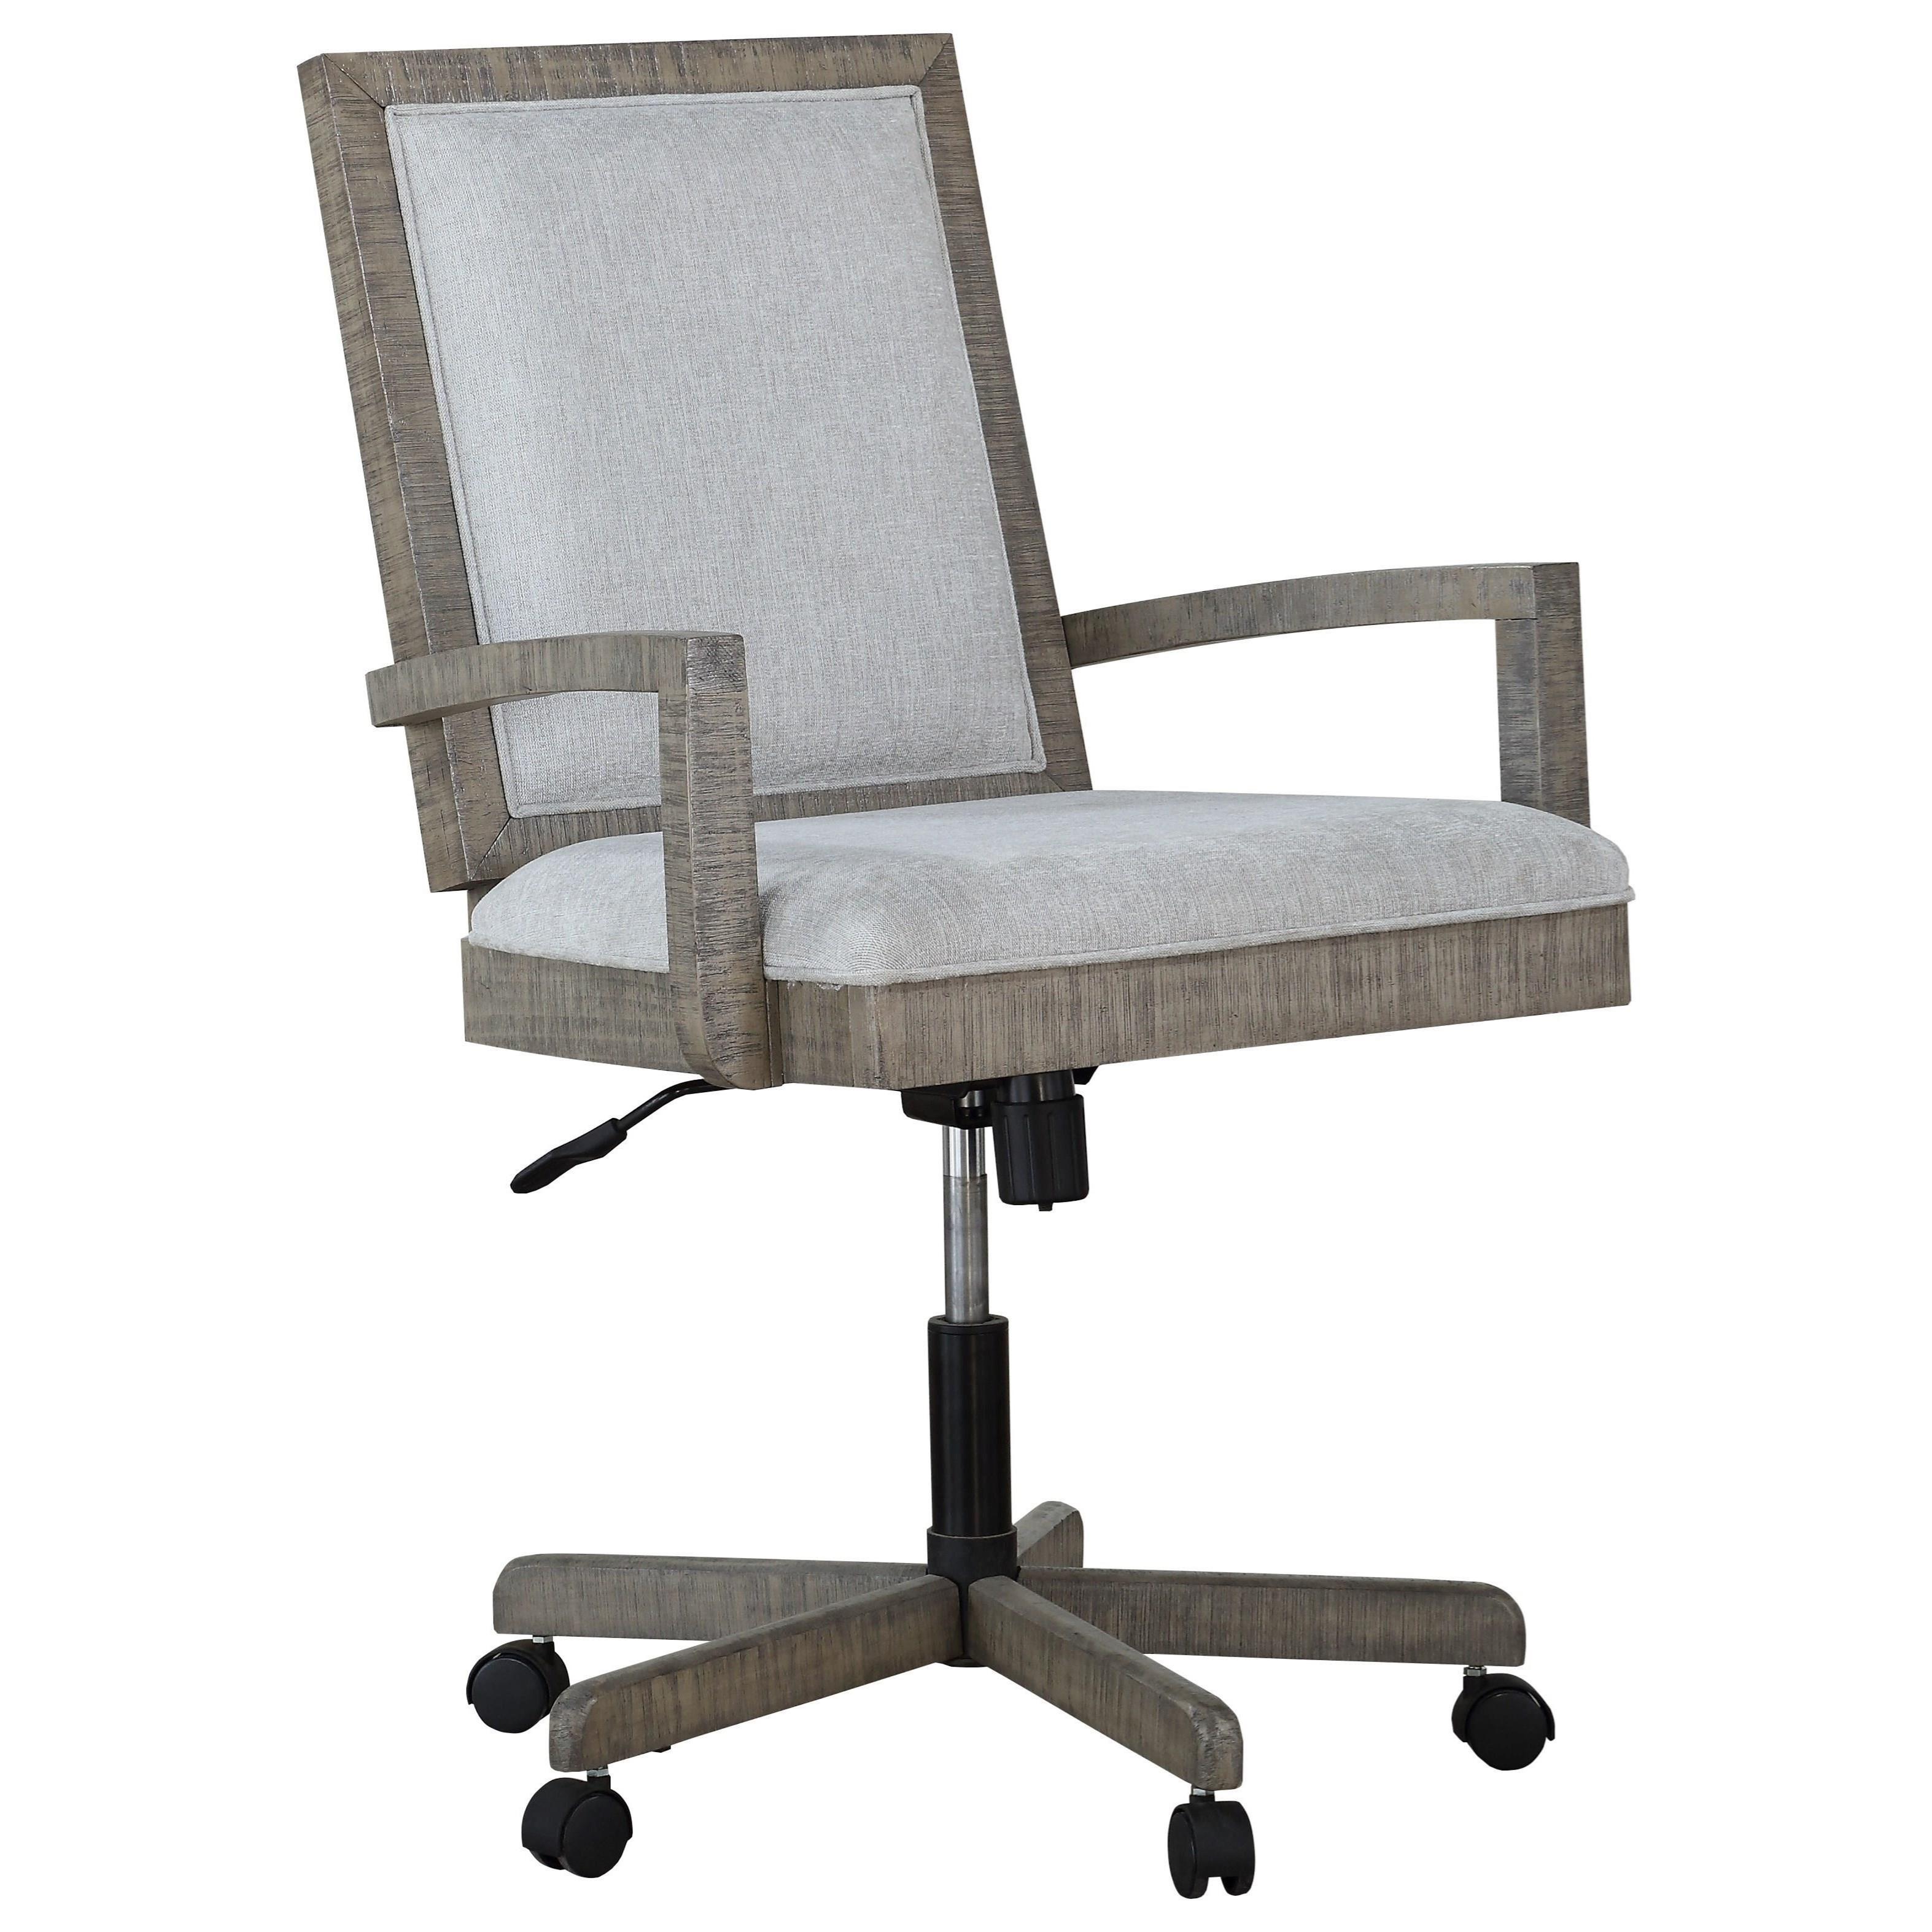 Artesia Executive Office Chair by Acme Furniture at Carolina Direct